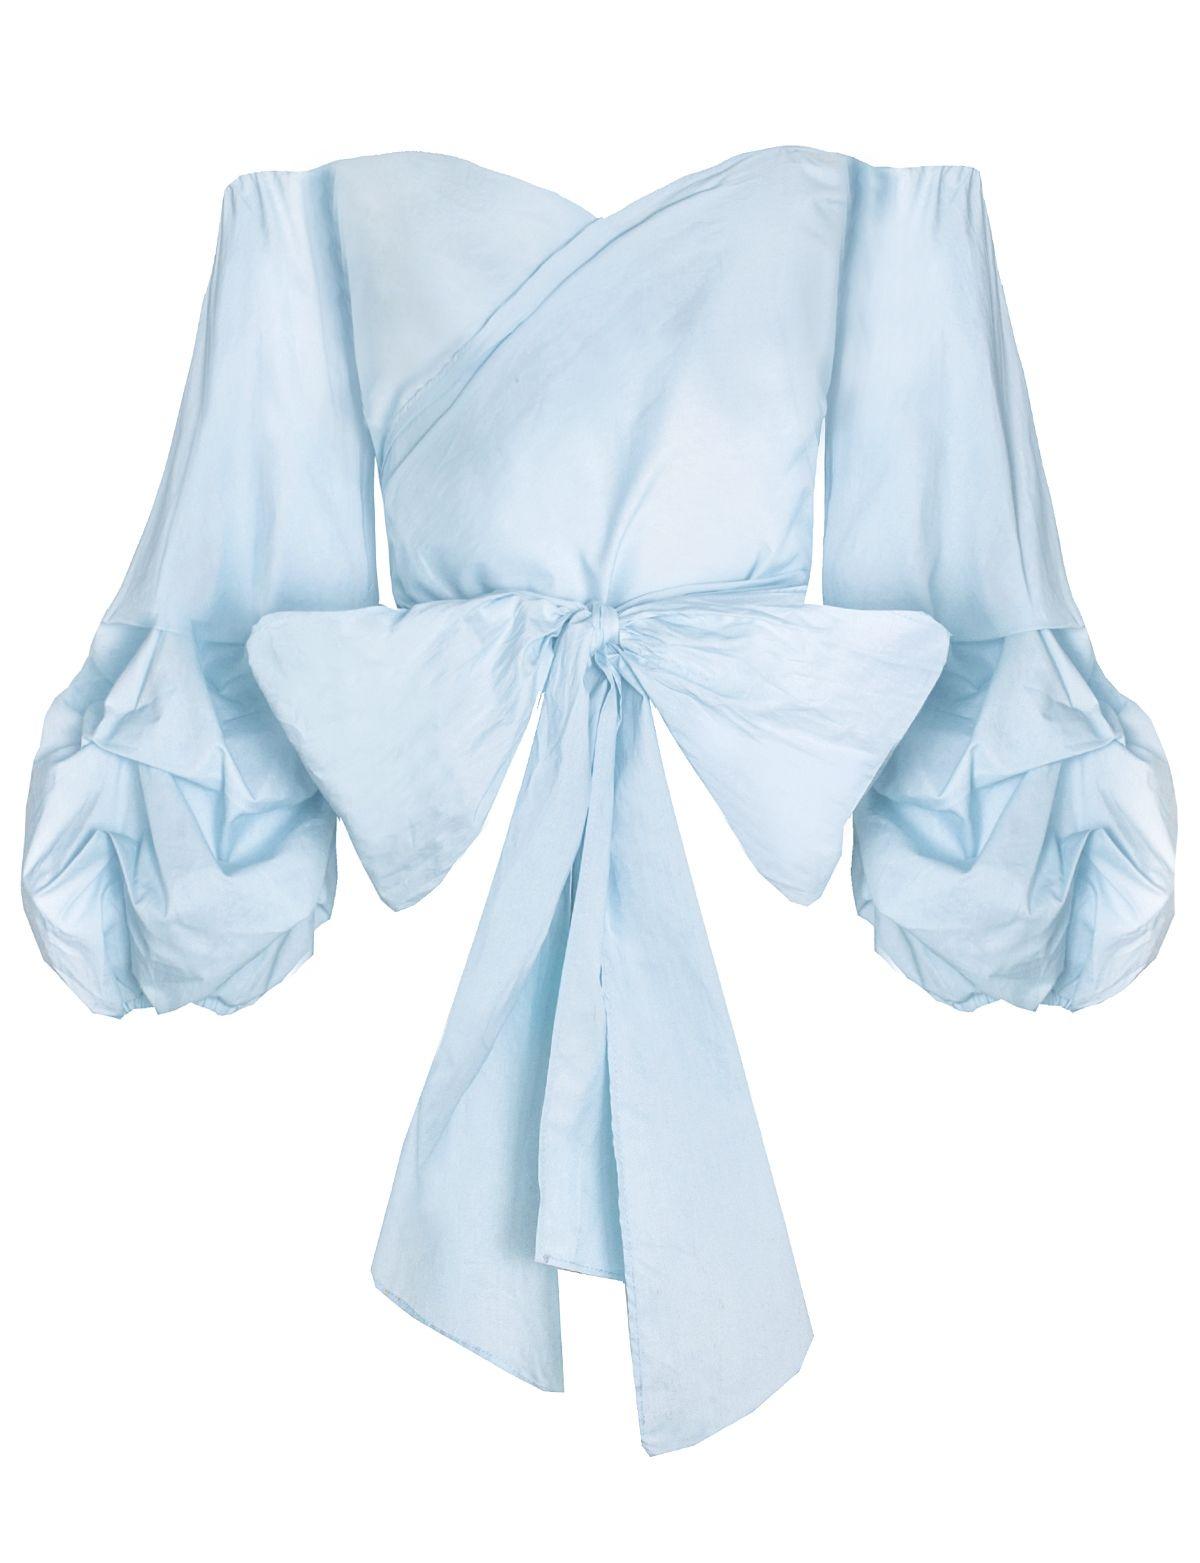 4424e3e487f322 Powder blue balloon sleeve wrap off the shoulder top . 100% cottonLength 24